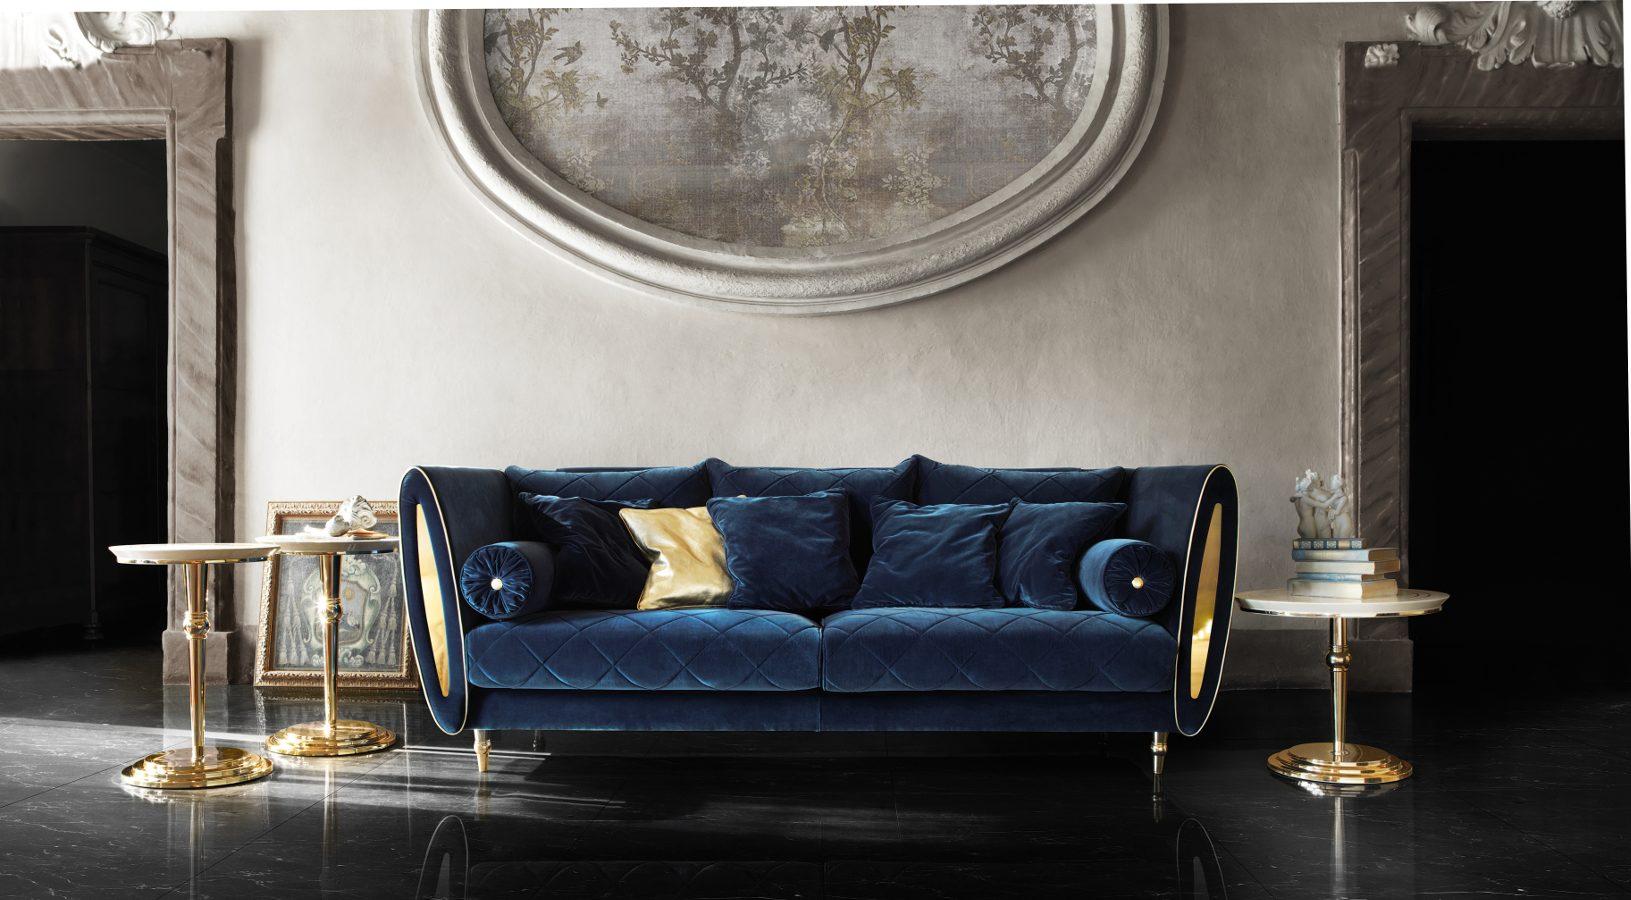 sipario kollektion sofa. Black Bedroom Furniture Sets. Home Design Ideas